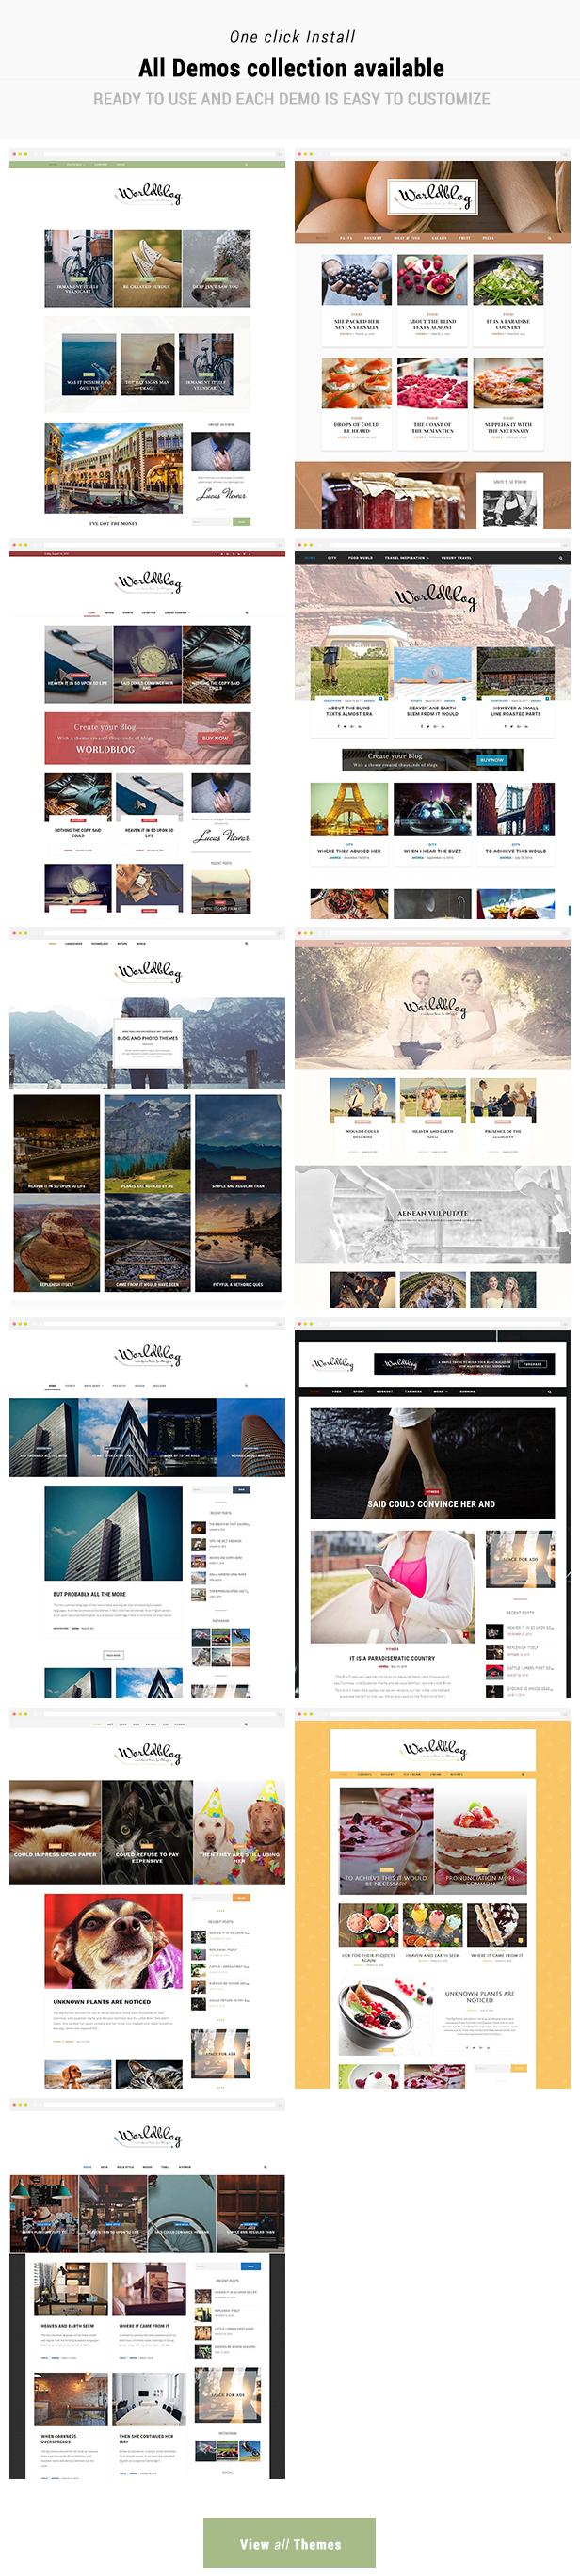 Worldblog - WordPress Blog and Magazine Theme - 3